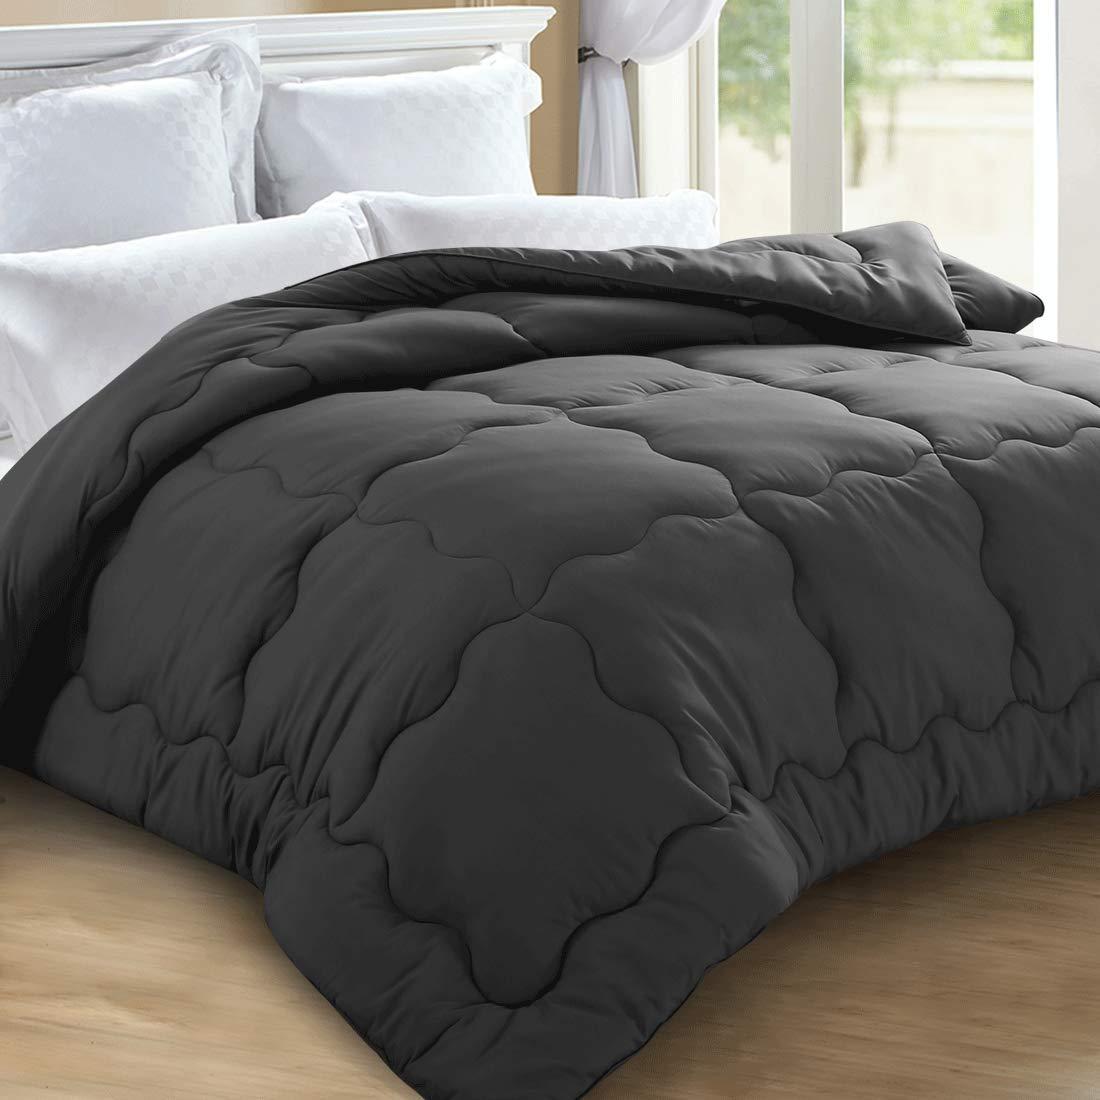 KARRISM All Season Down Alternative Queen Comforter, Winter Warm Ultra Soft Quilted Duvet Insert with Corner Tabs, Wavy Box Stitched, Hypoallergenic, Luxury Hotel Collection (Grey, 88 x 88 inch)